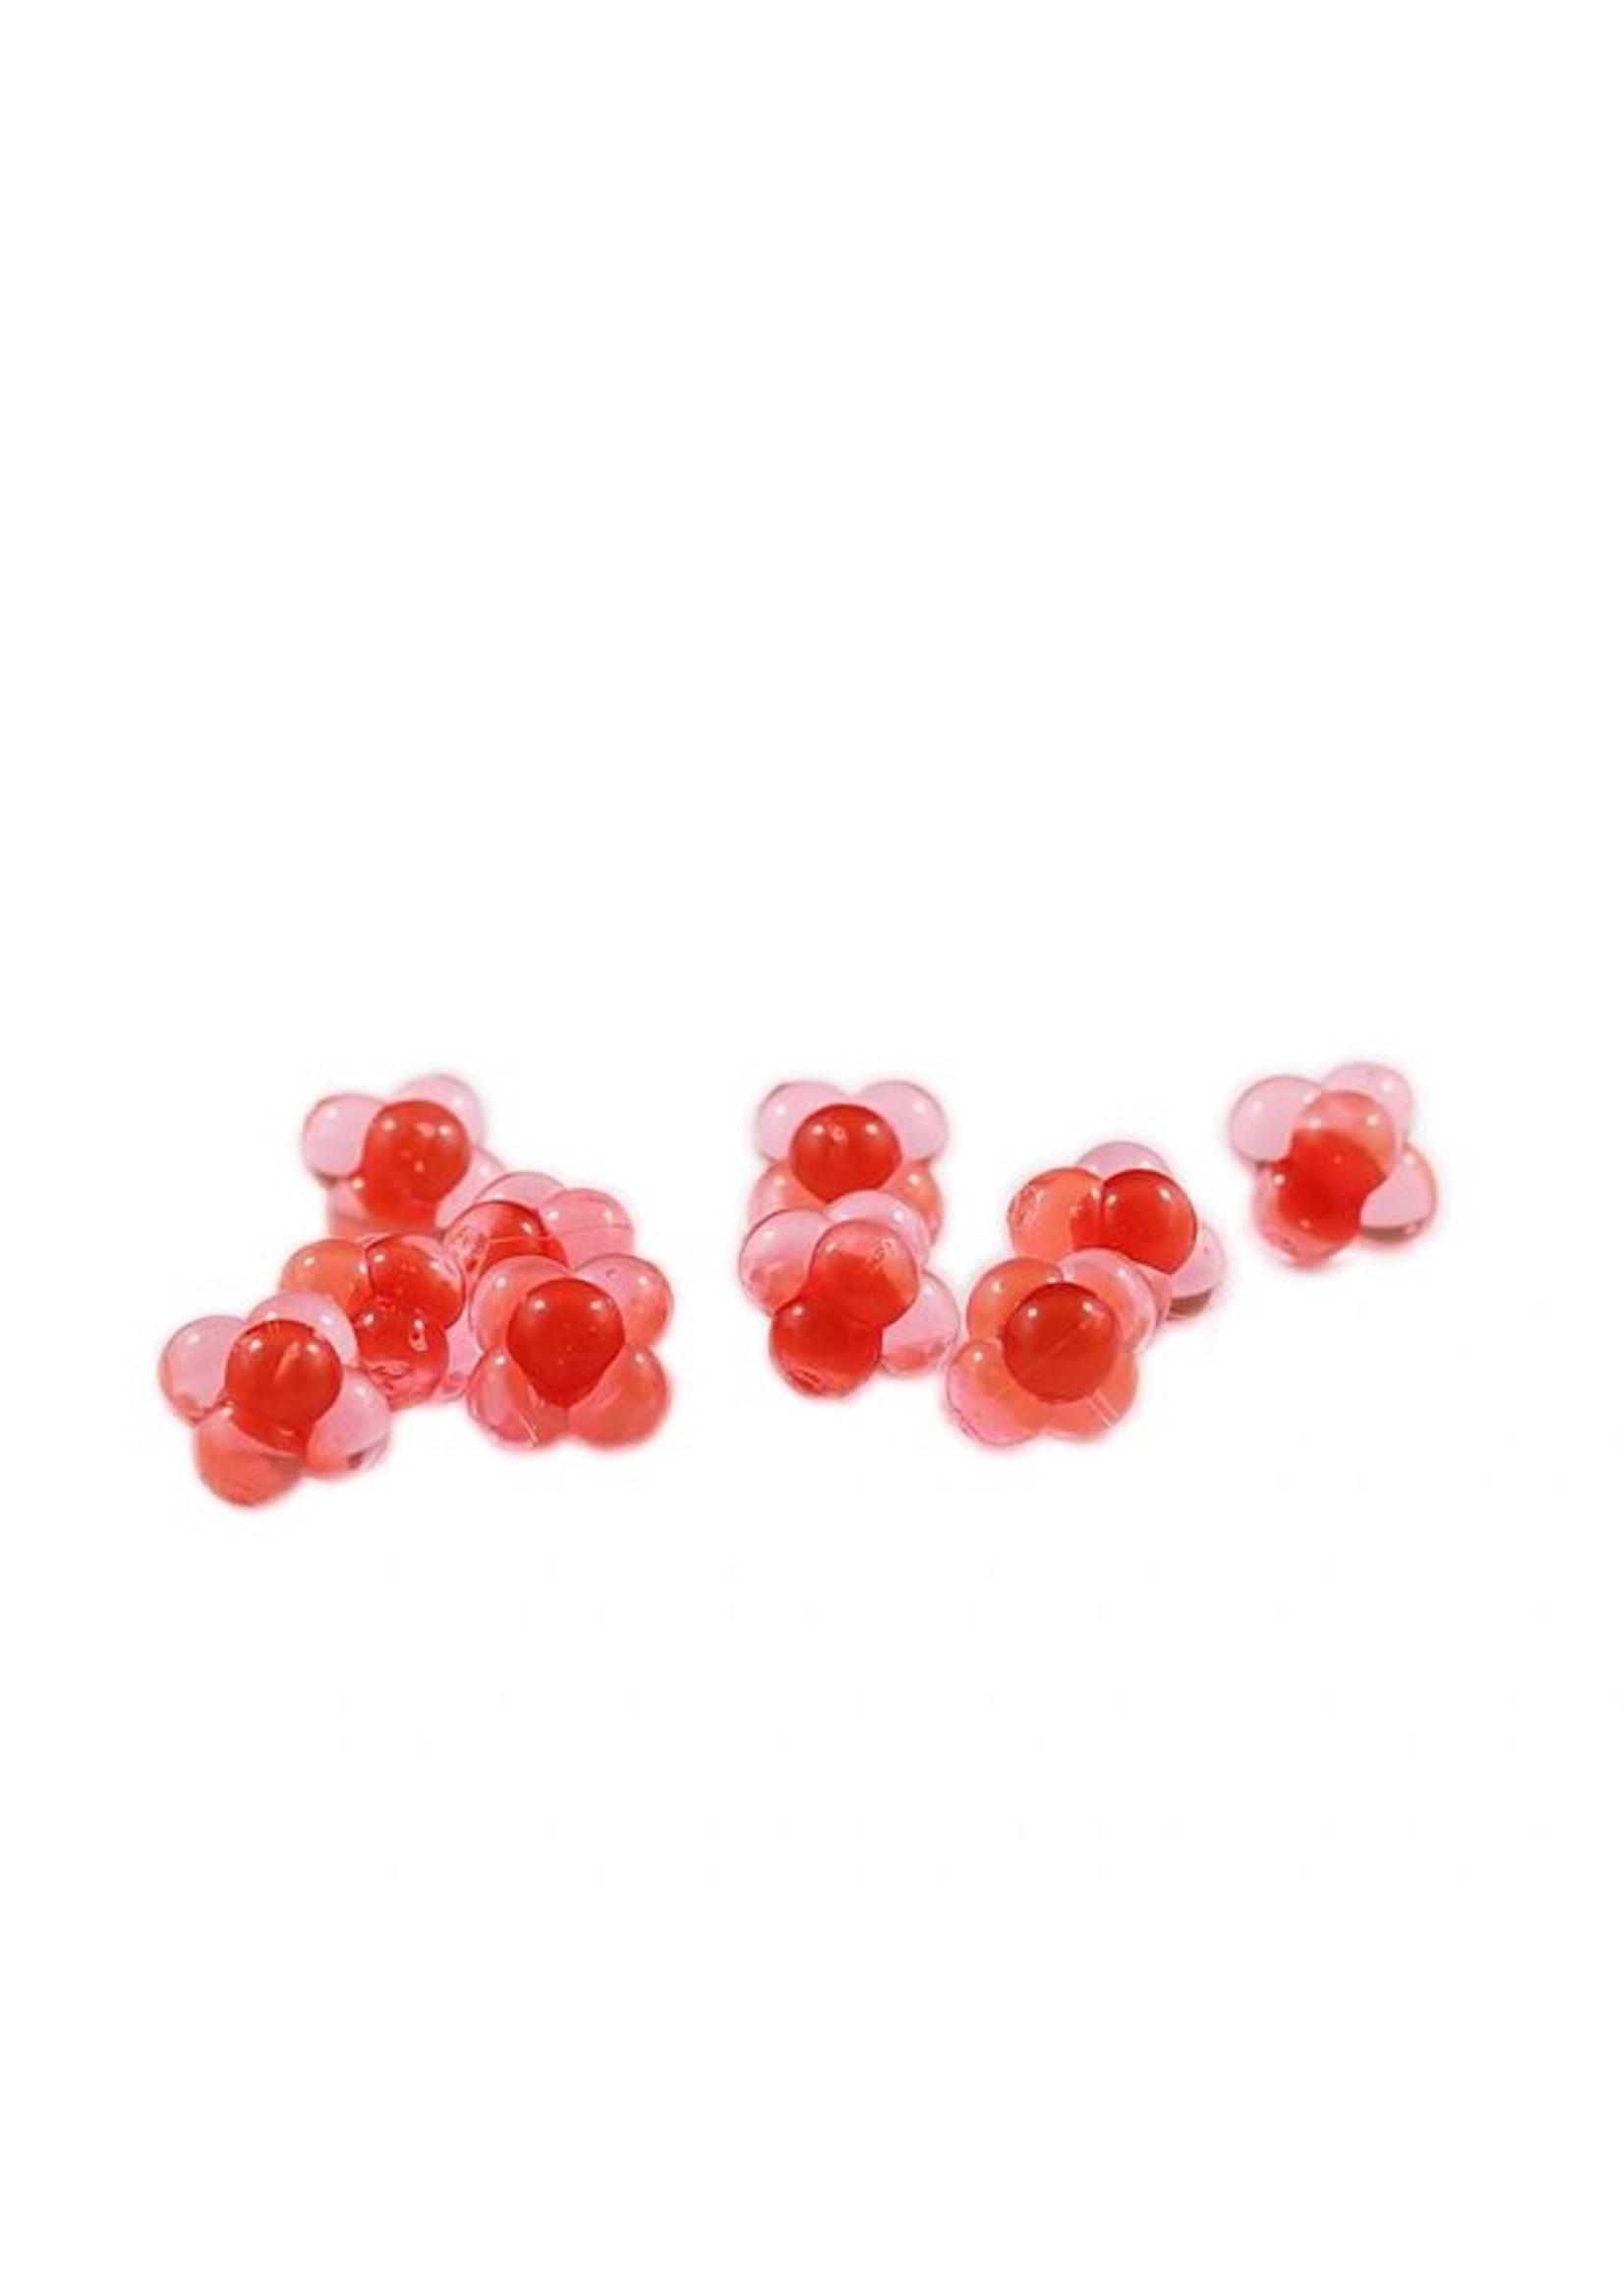 Cleardrift Cleardrift Embryo Egg Clusters Lg Candy Apple w/Red Embryo